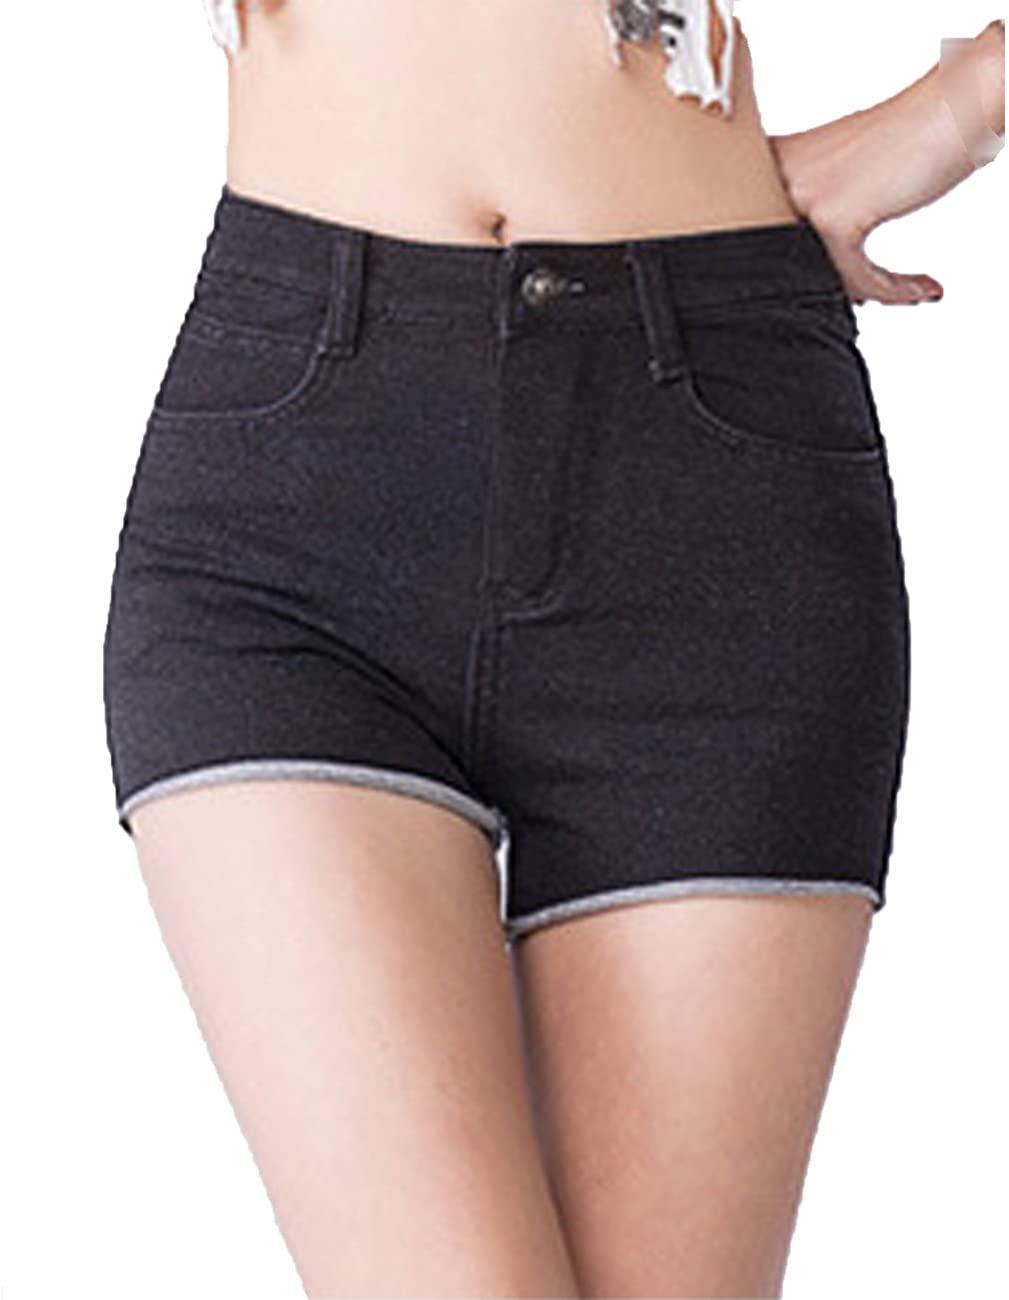 KJY Women's High Waist Stretch Denim Shorts